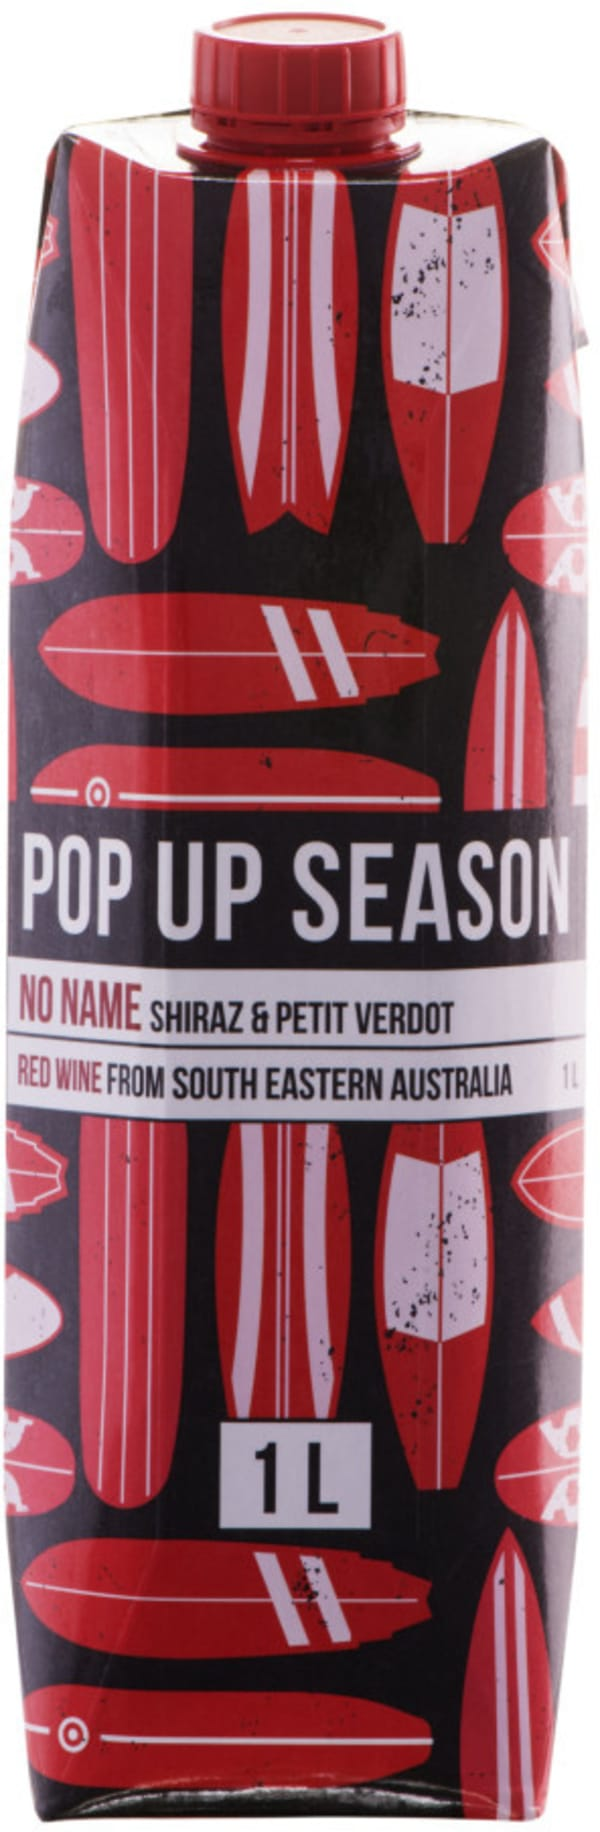 Pop Up Season No Name carton package